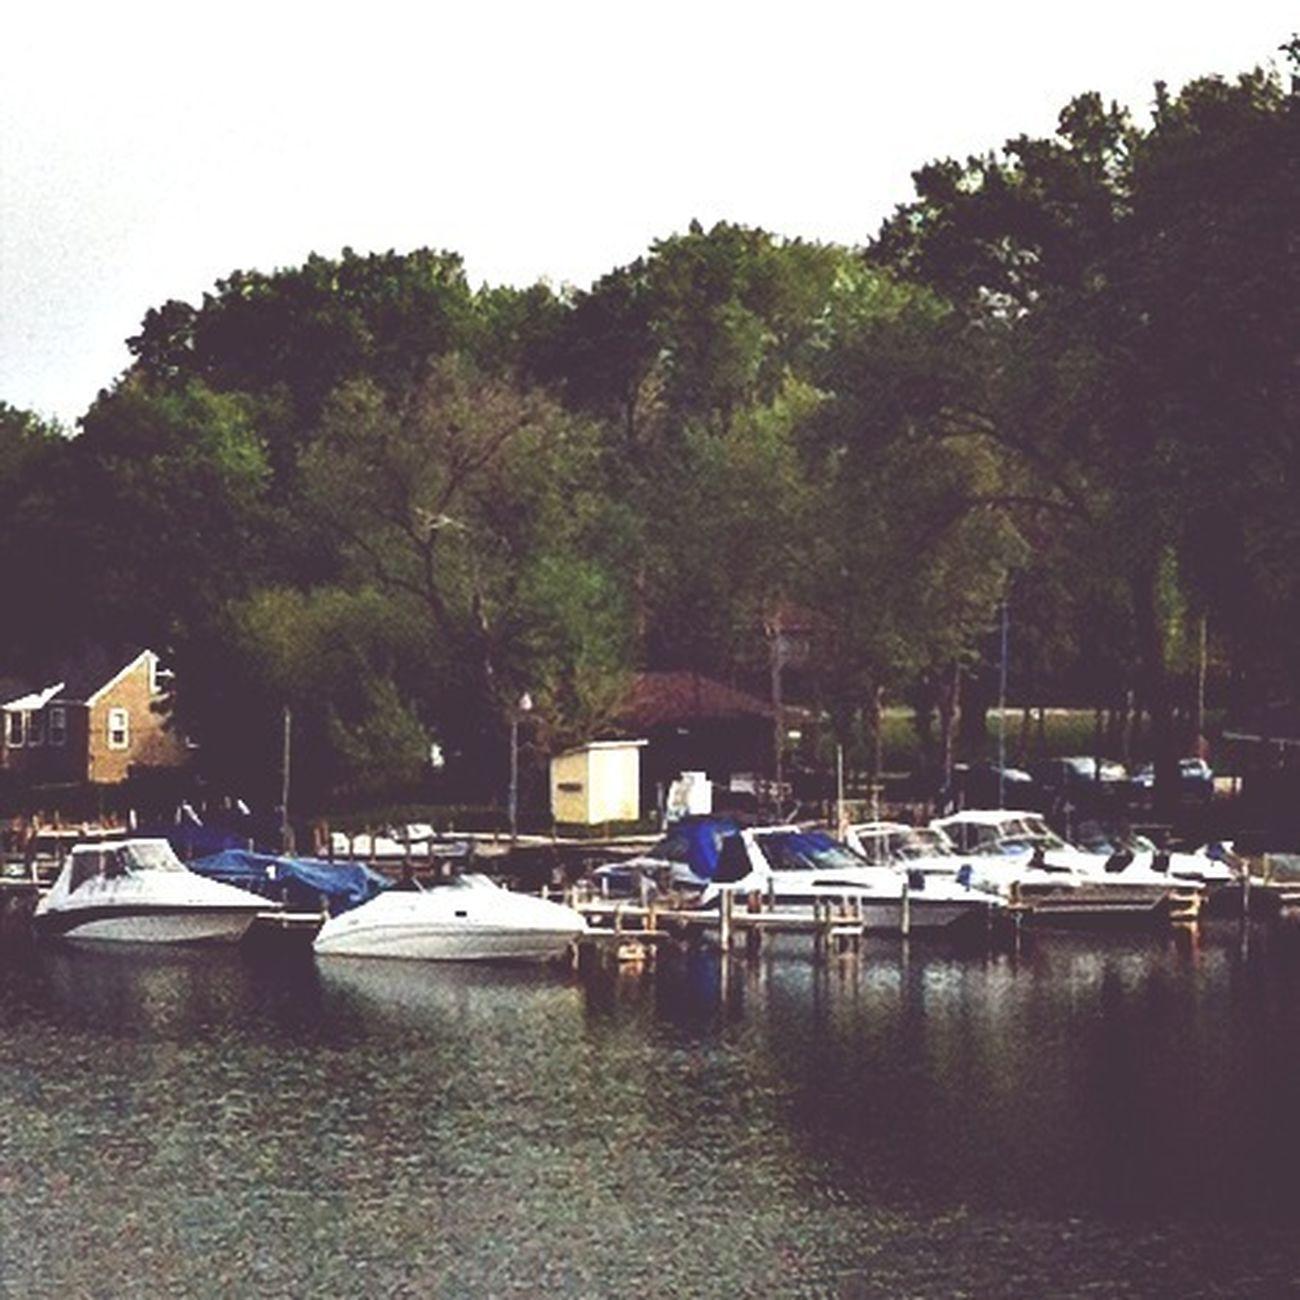 Boats Lake Wisconsin Boat Dock